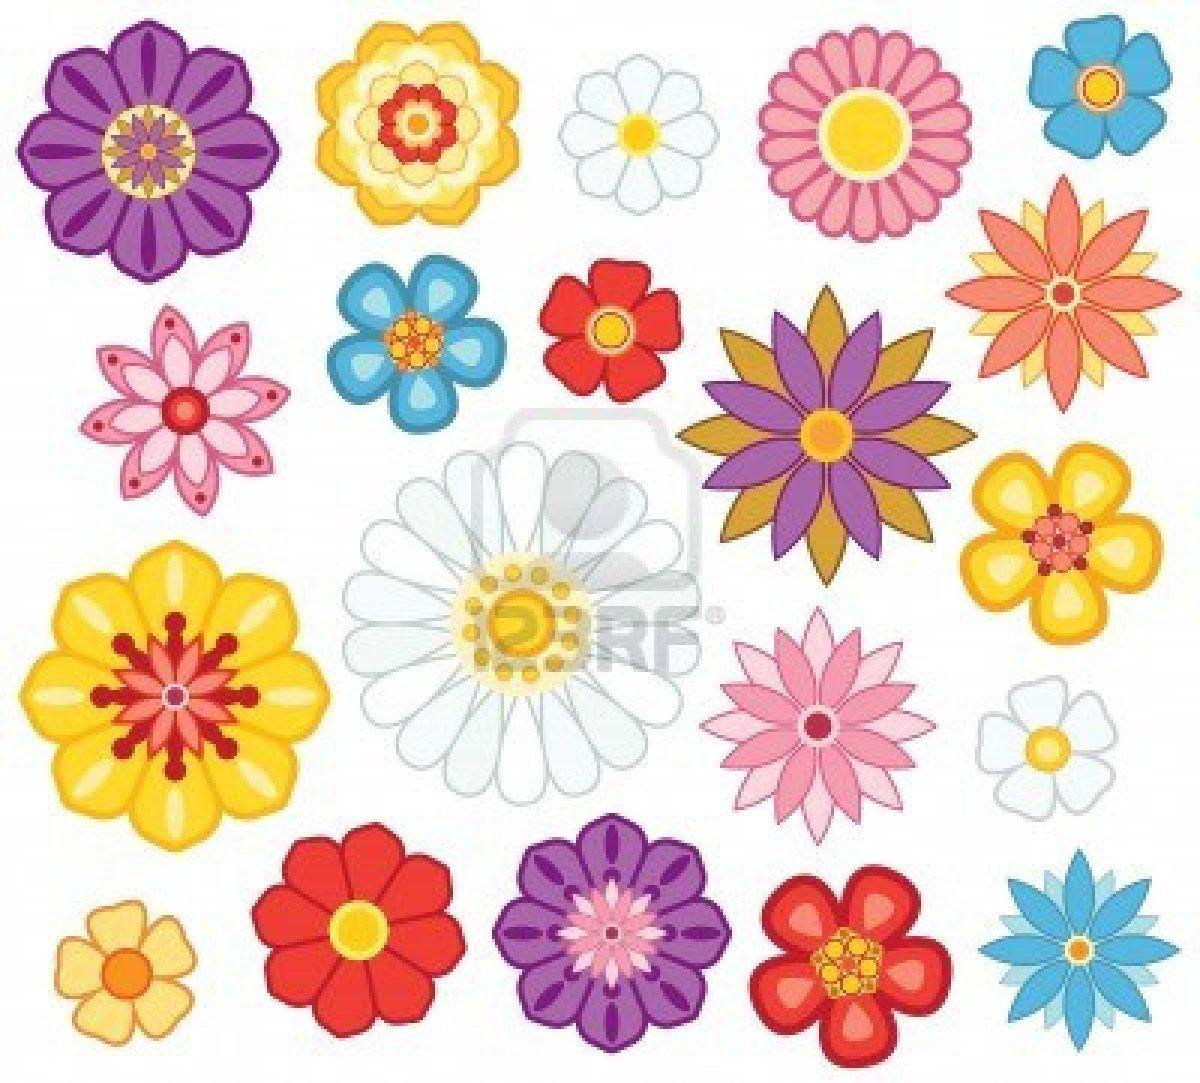 cartoon flowers Google Search Kids stuf Pinterest